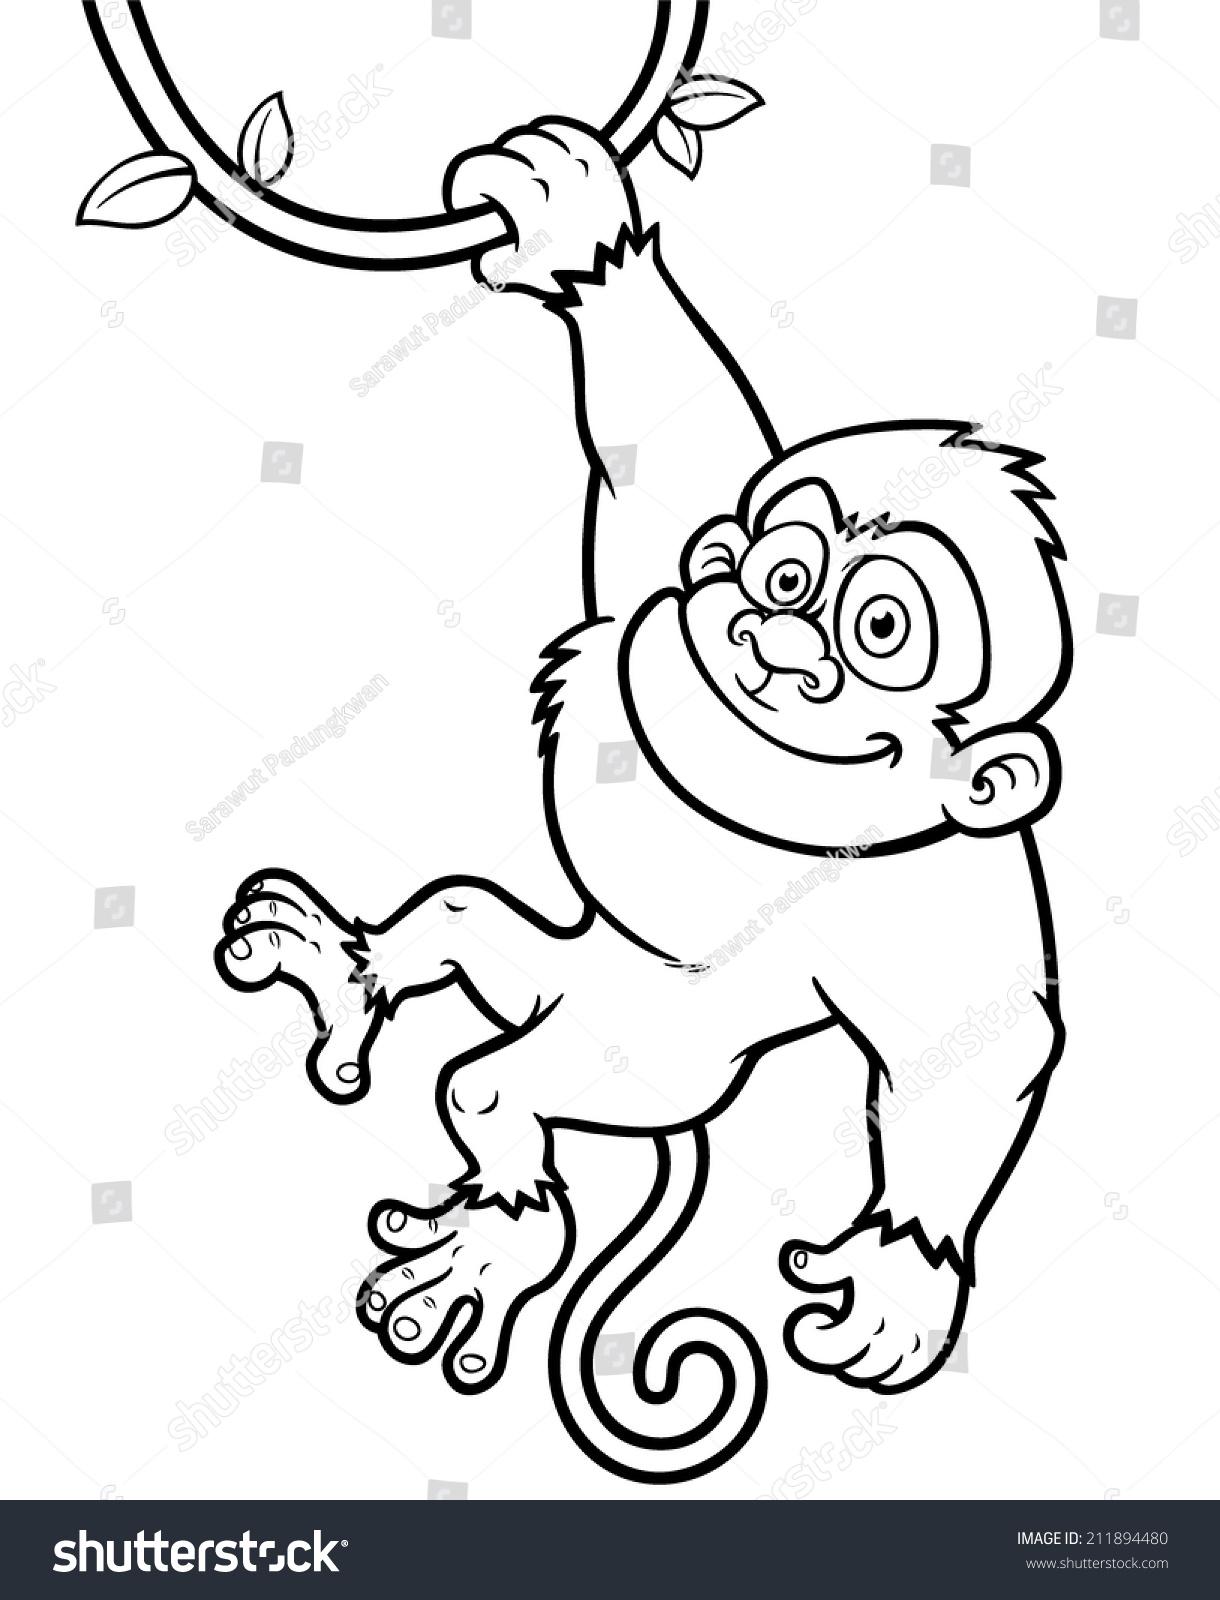 Vector Illustration of Cartoon Monkey - Coloring book | EZ Canvas